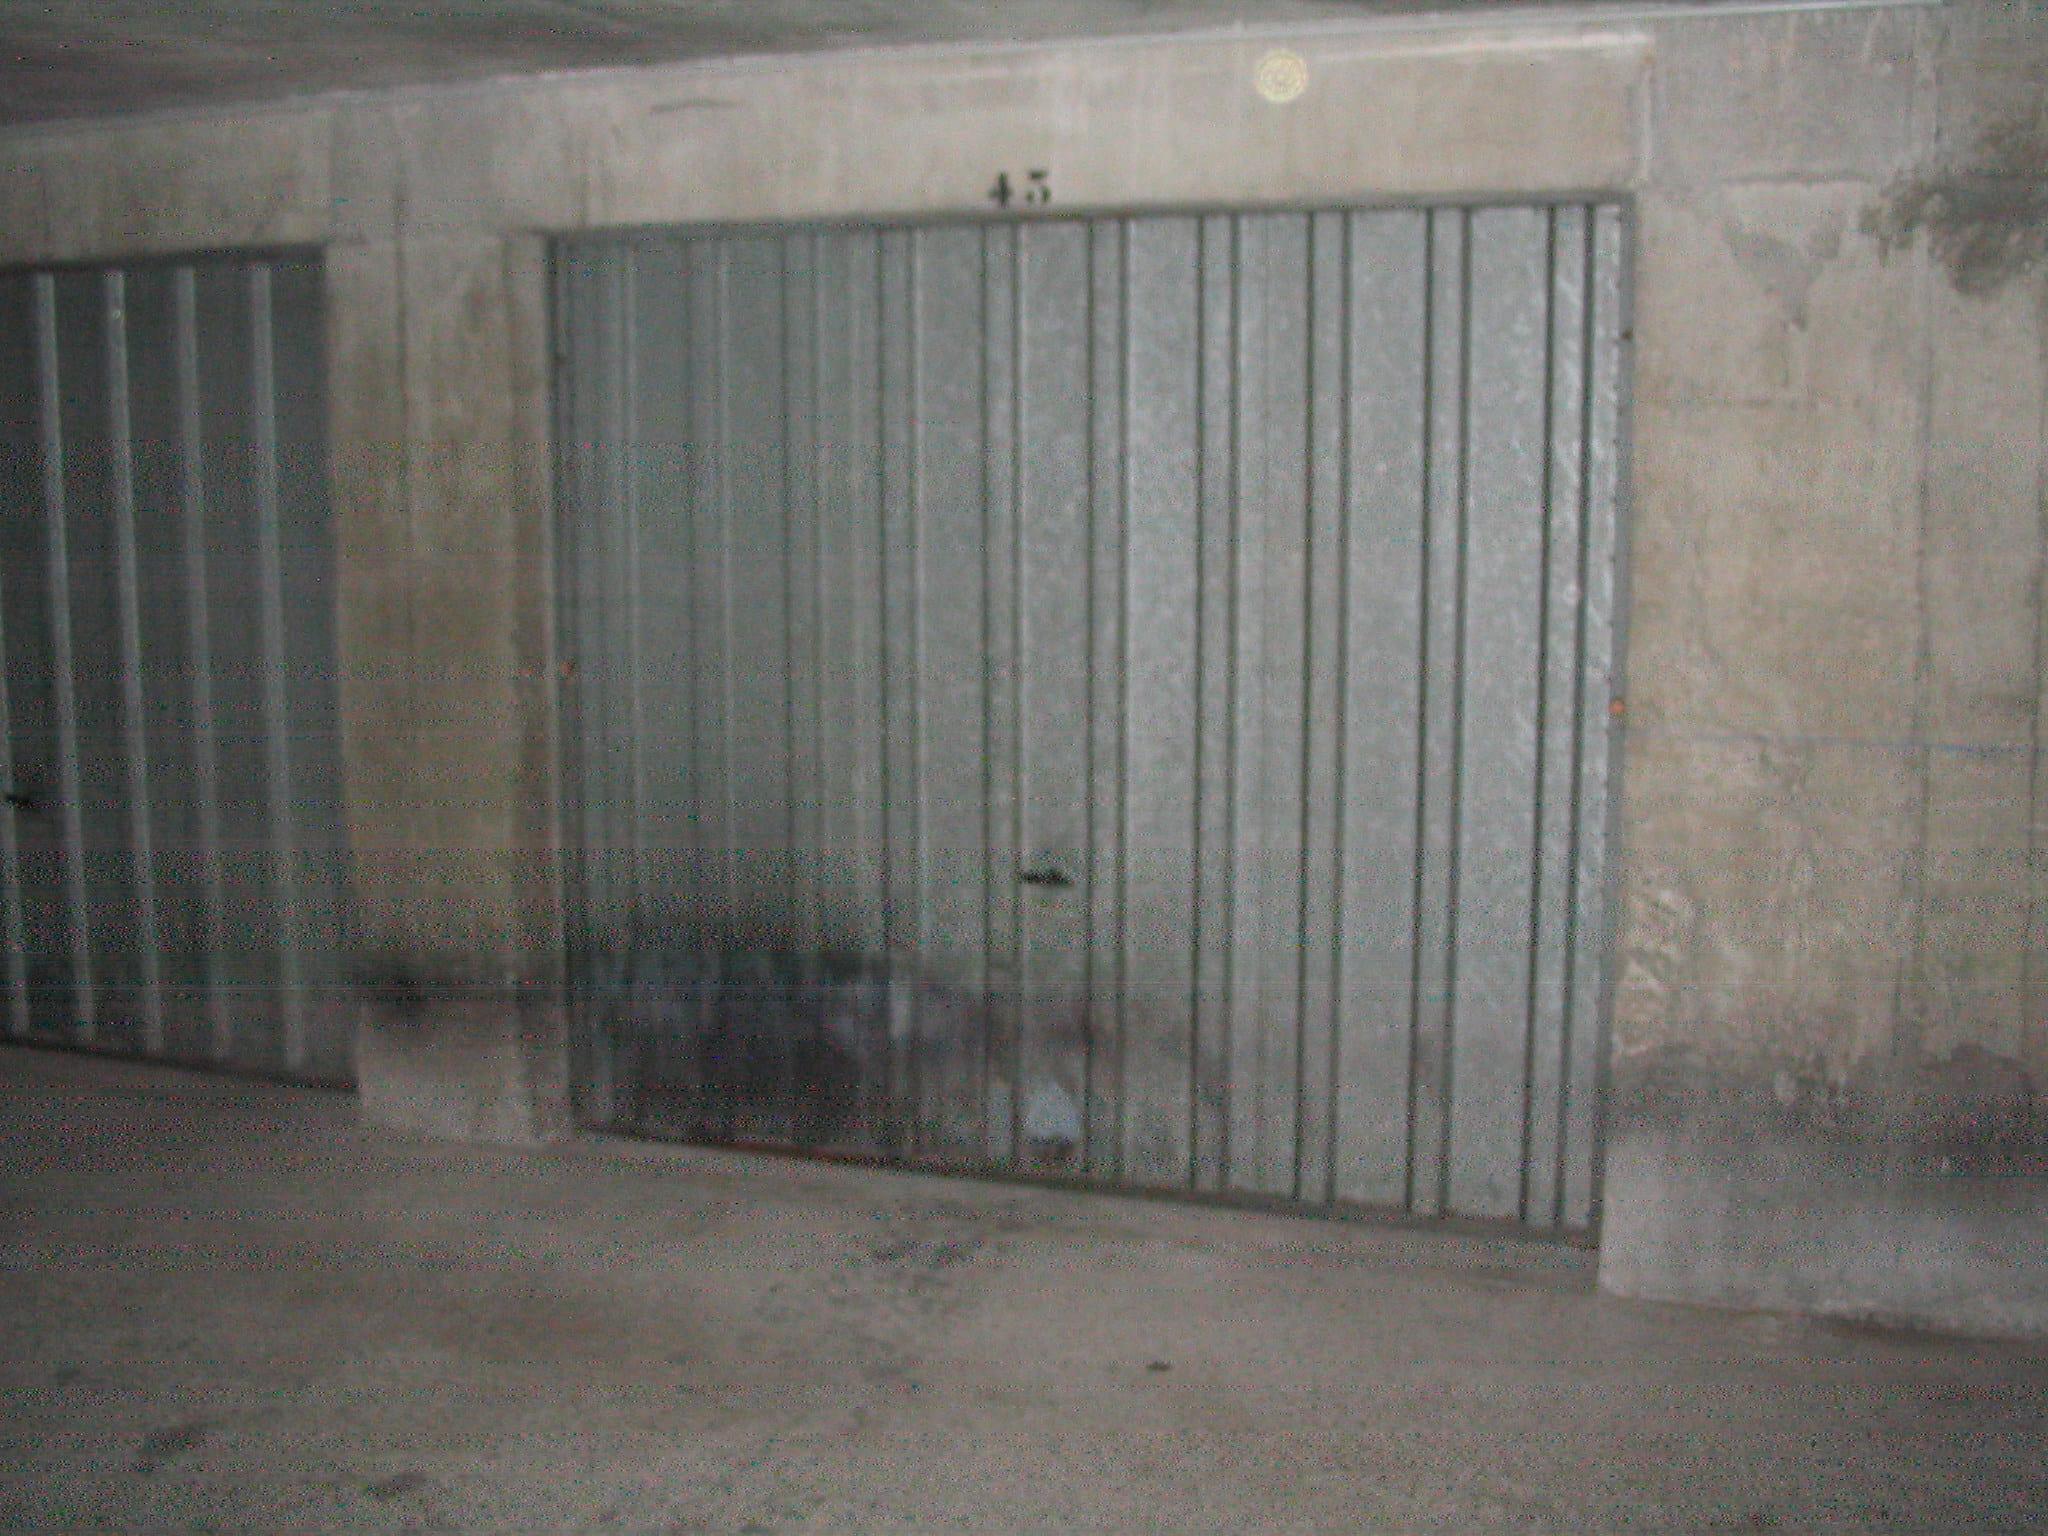 serrure ancienne porte de garage basculante cass e r solu. Black Bedroom Furniture Sets. Home Design Ideas